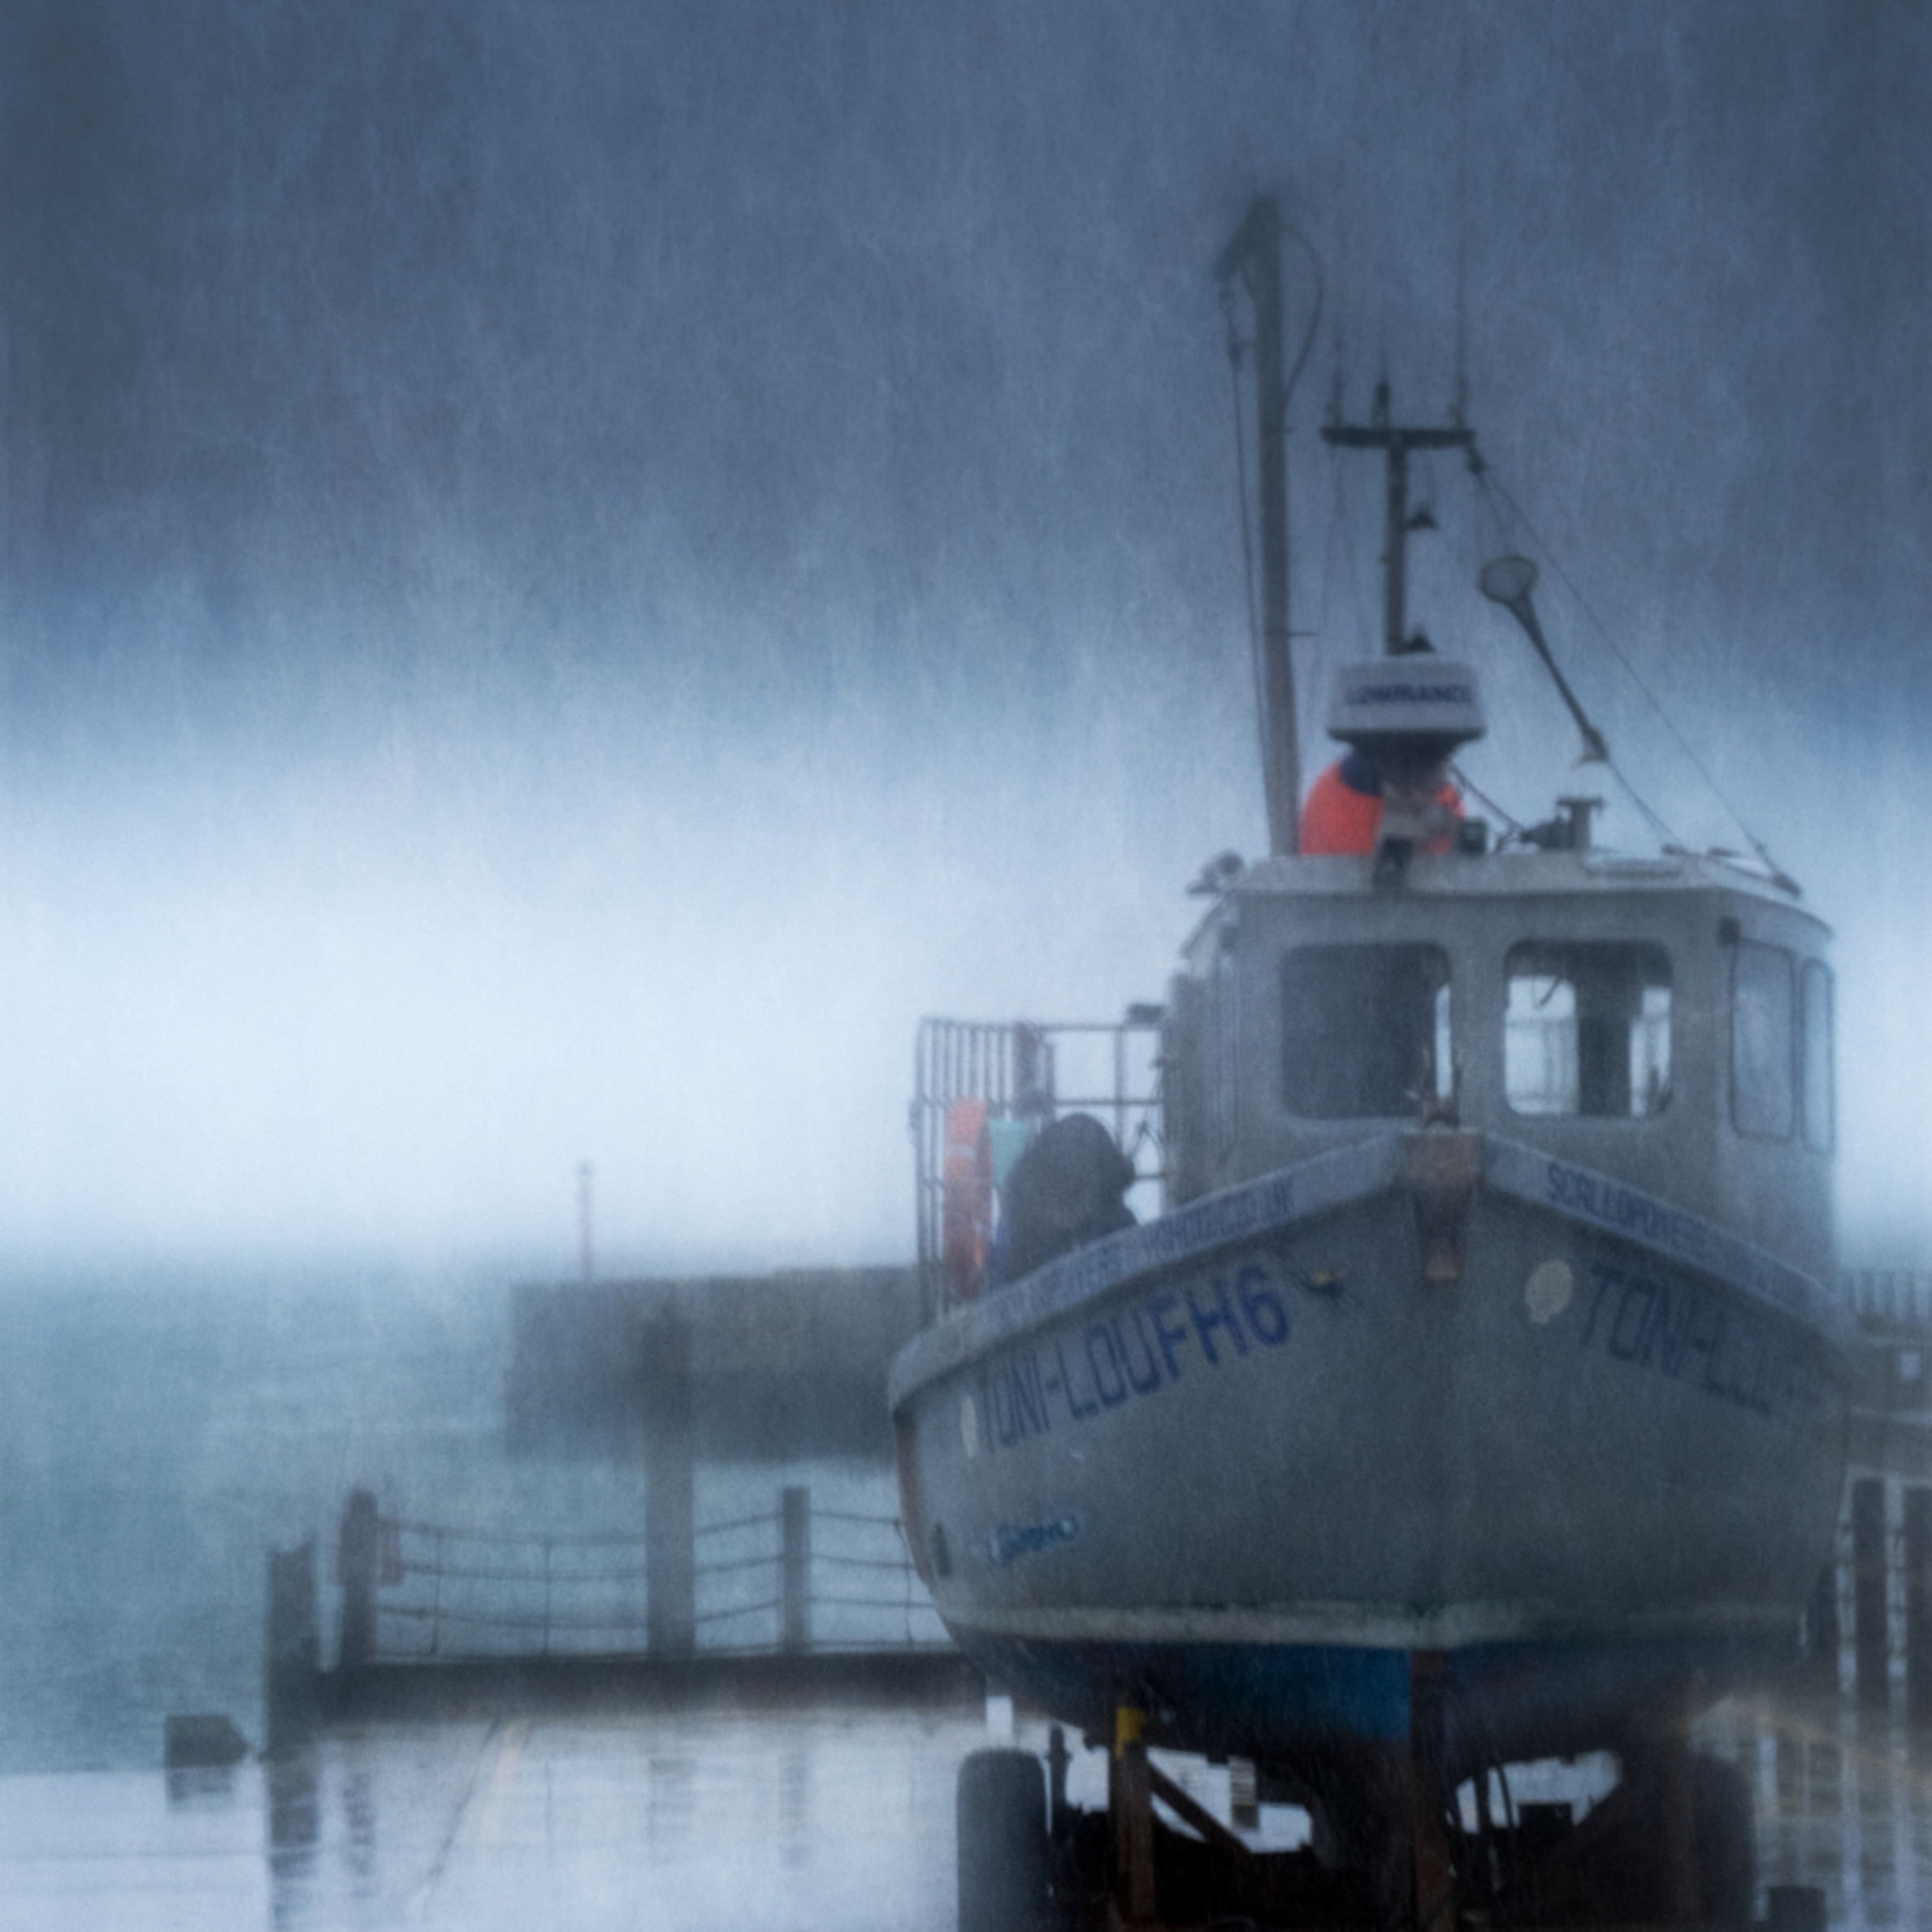 Wes bay fishing boat jbihfw